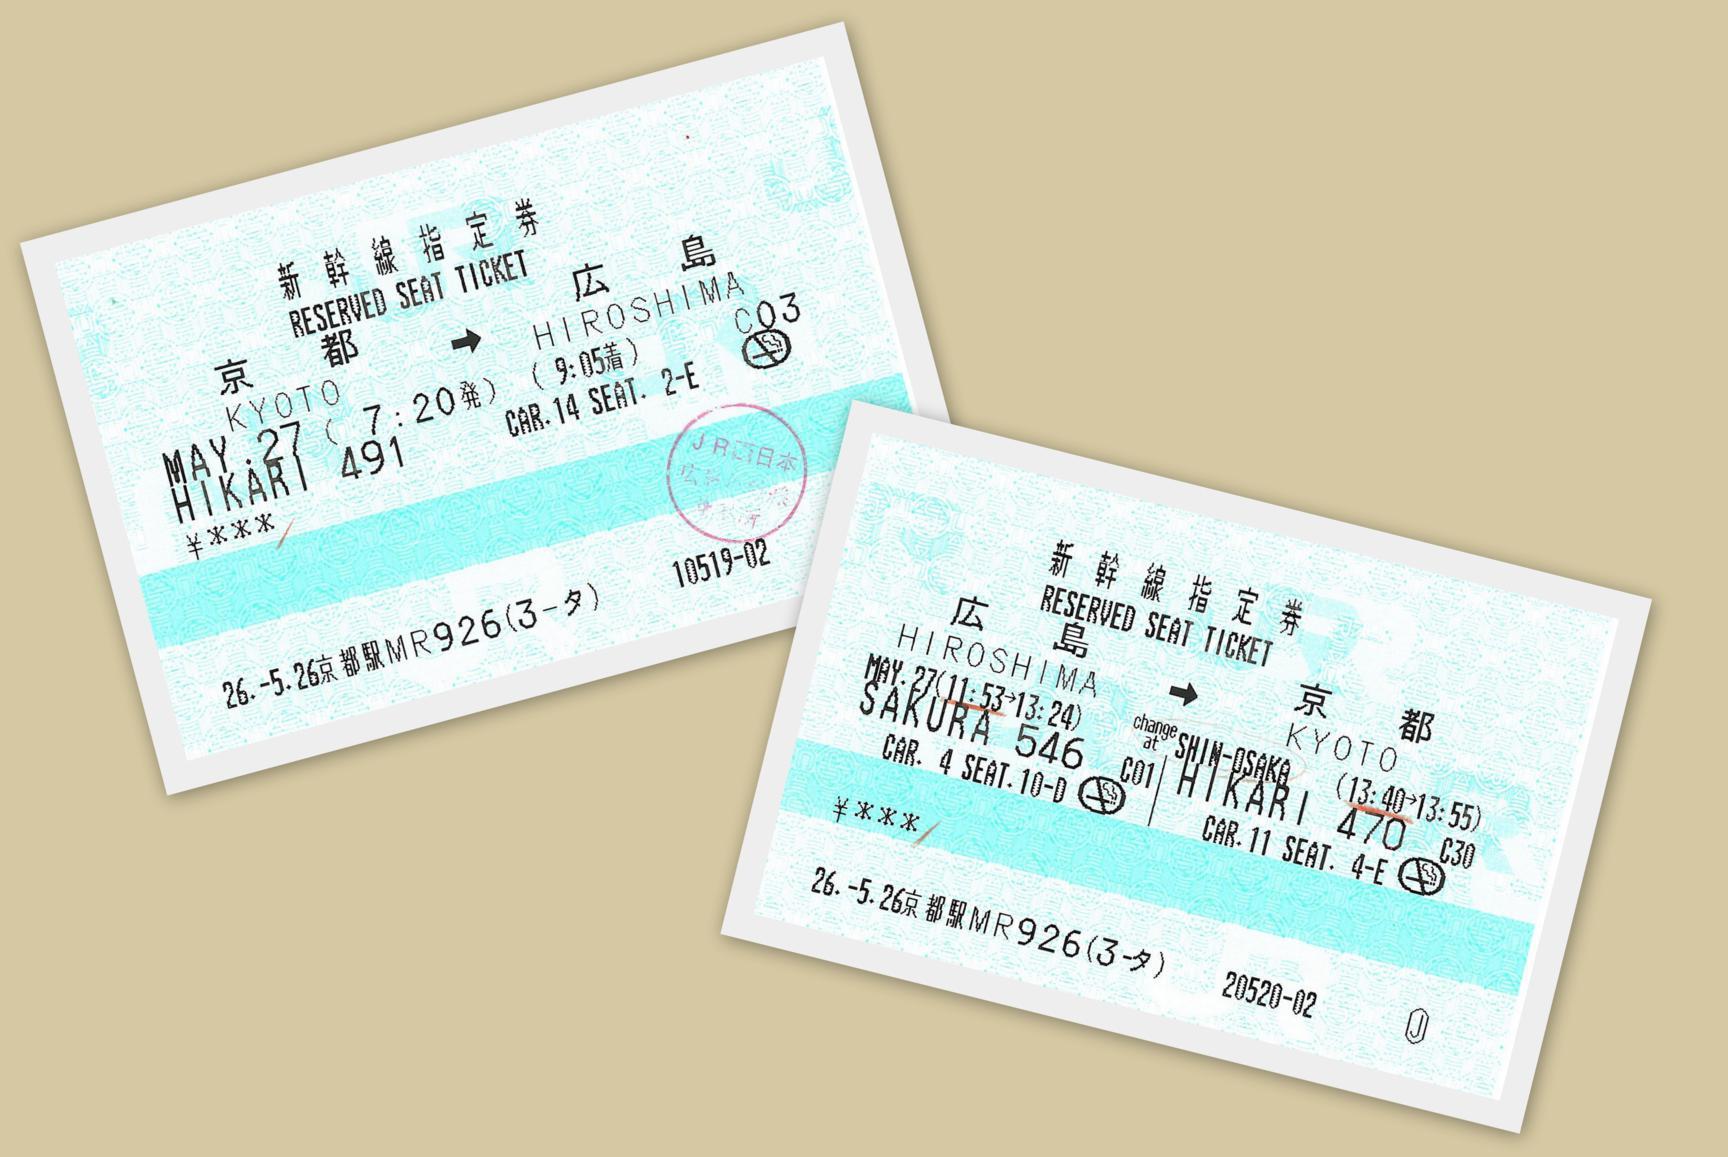 tren-kyoto-hiroshima